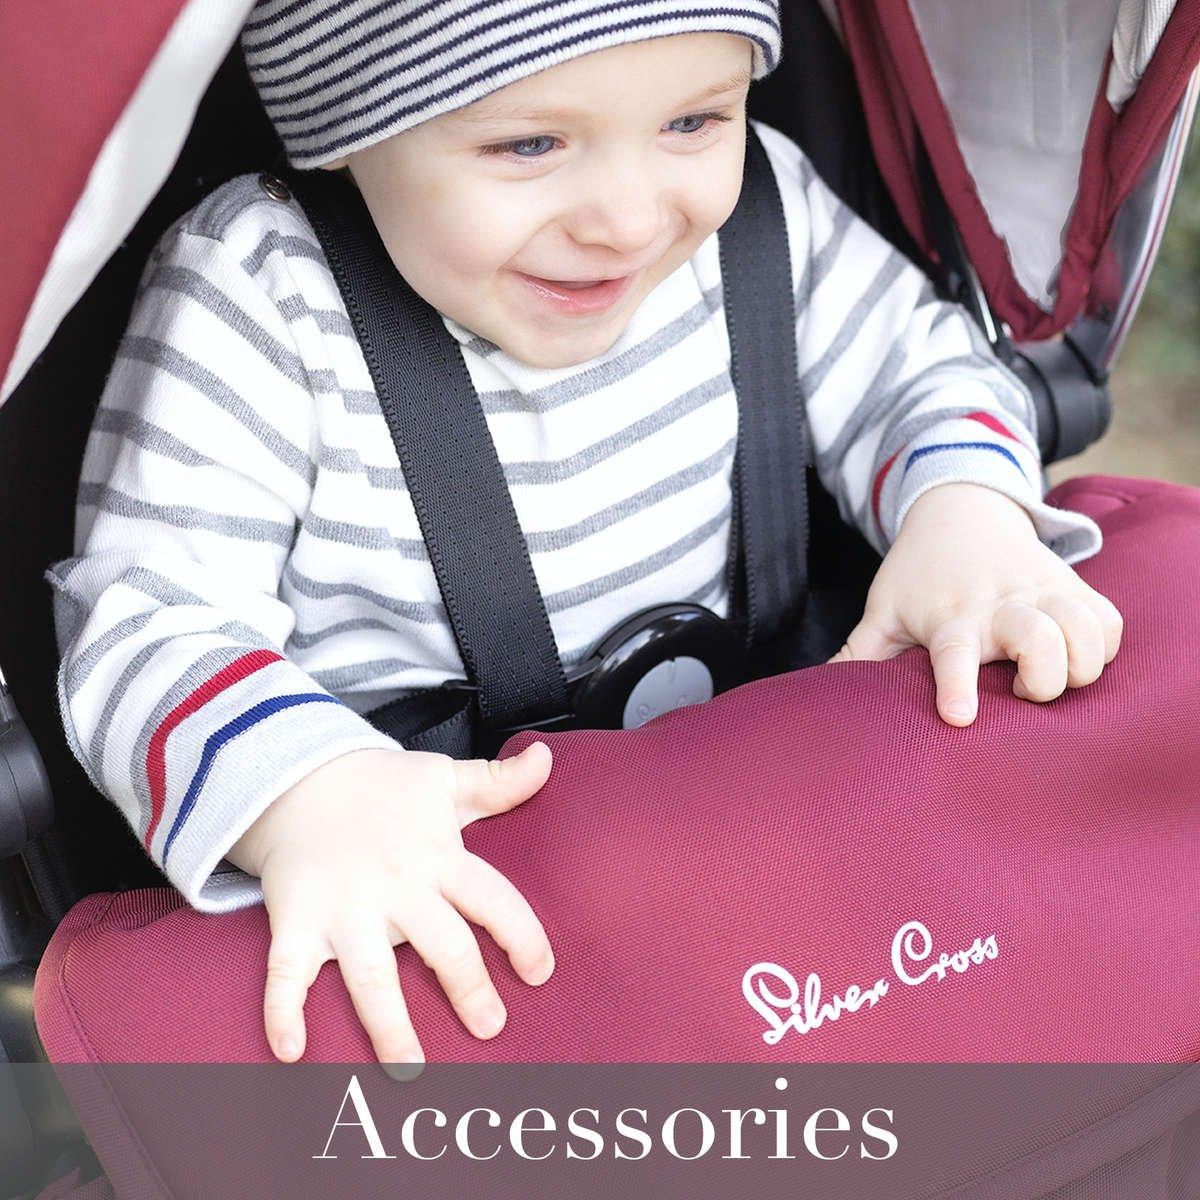 silvercross accessories